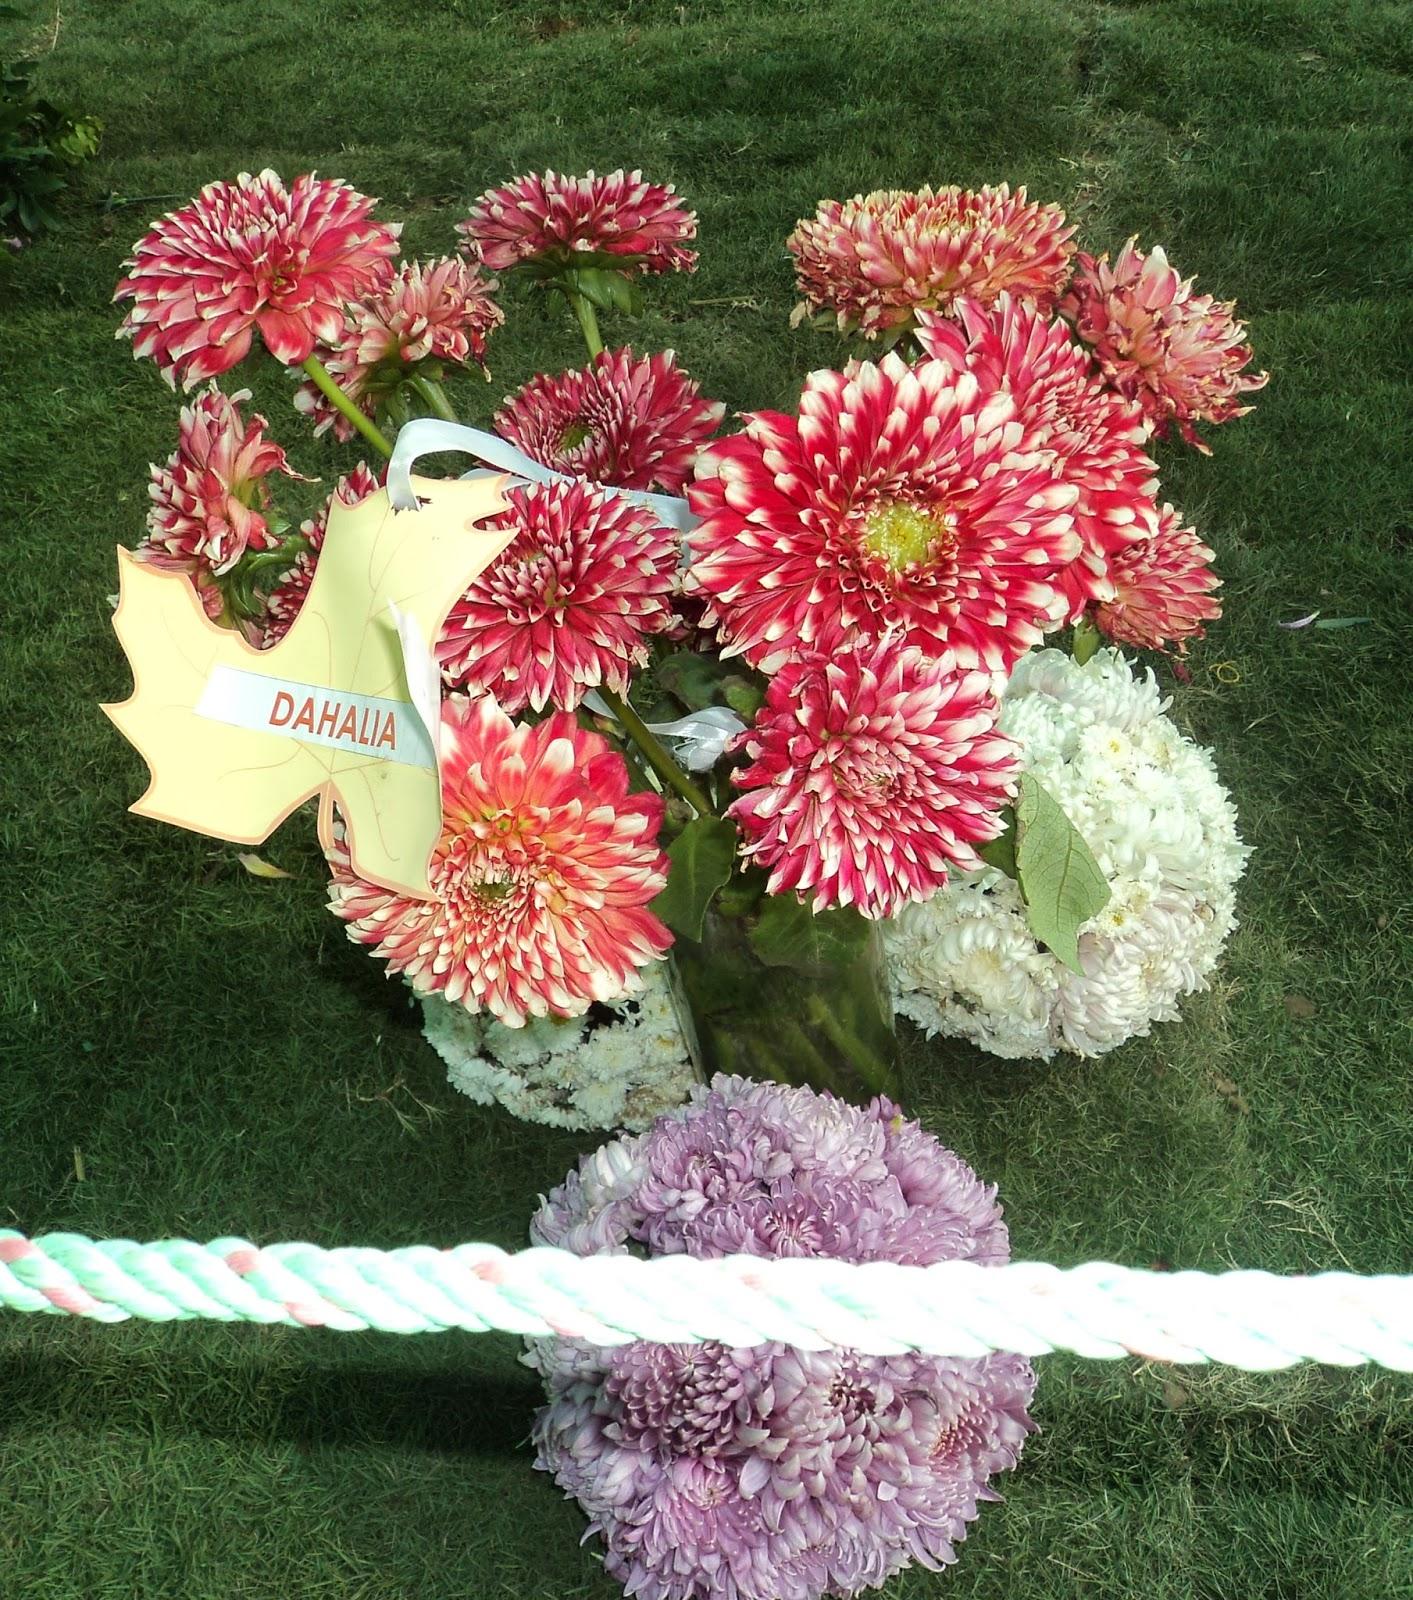 dahlia flower ahmedabad